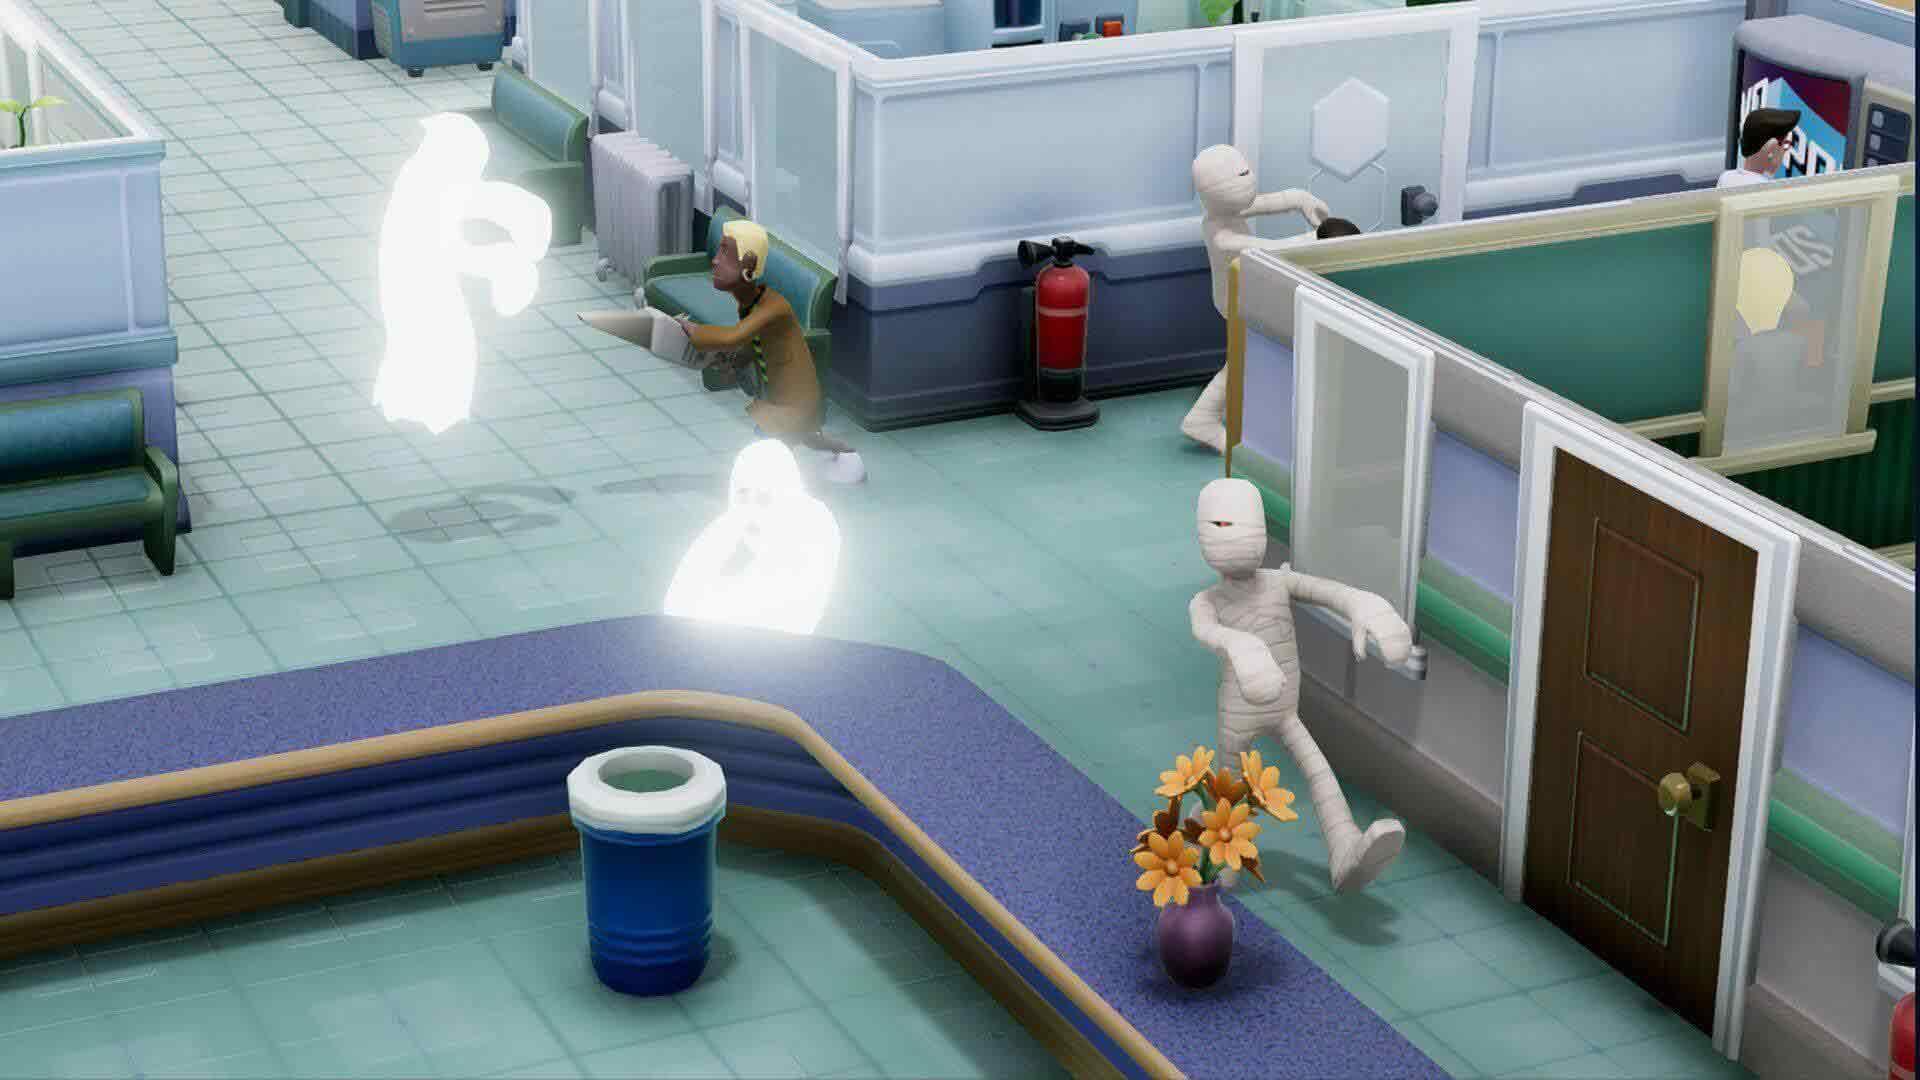 Two-Point-Hospital-โรงพยาบาลเพี้ยน-สุดฮา3